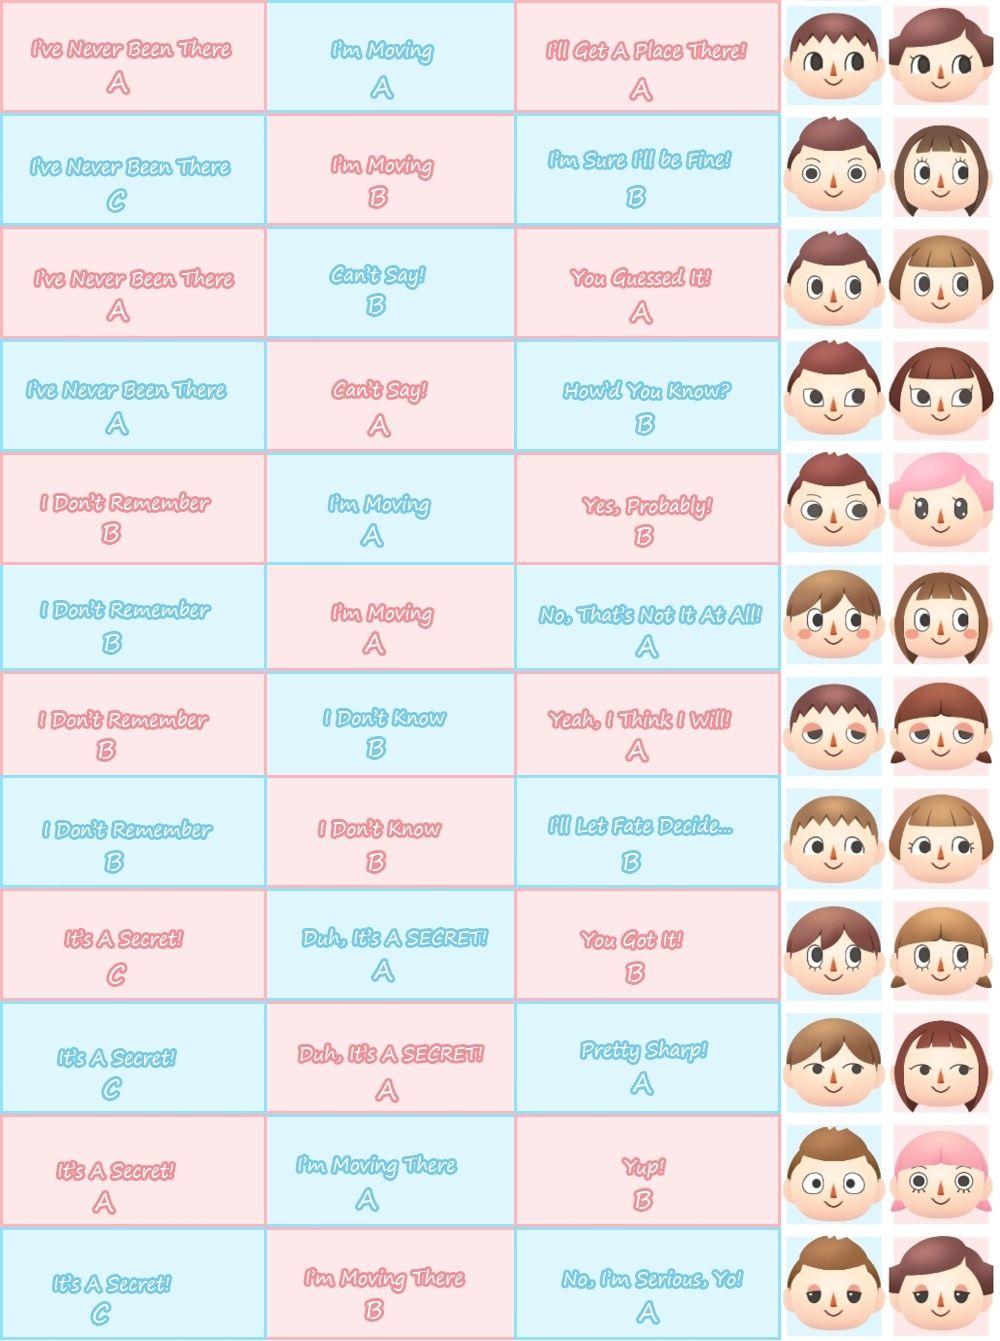 Animal Crossing New Leaf Hairstyle New Leaf Hair Guide Acnl Hair Guide Animal Crossing Hair Guide